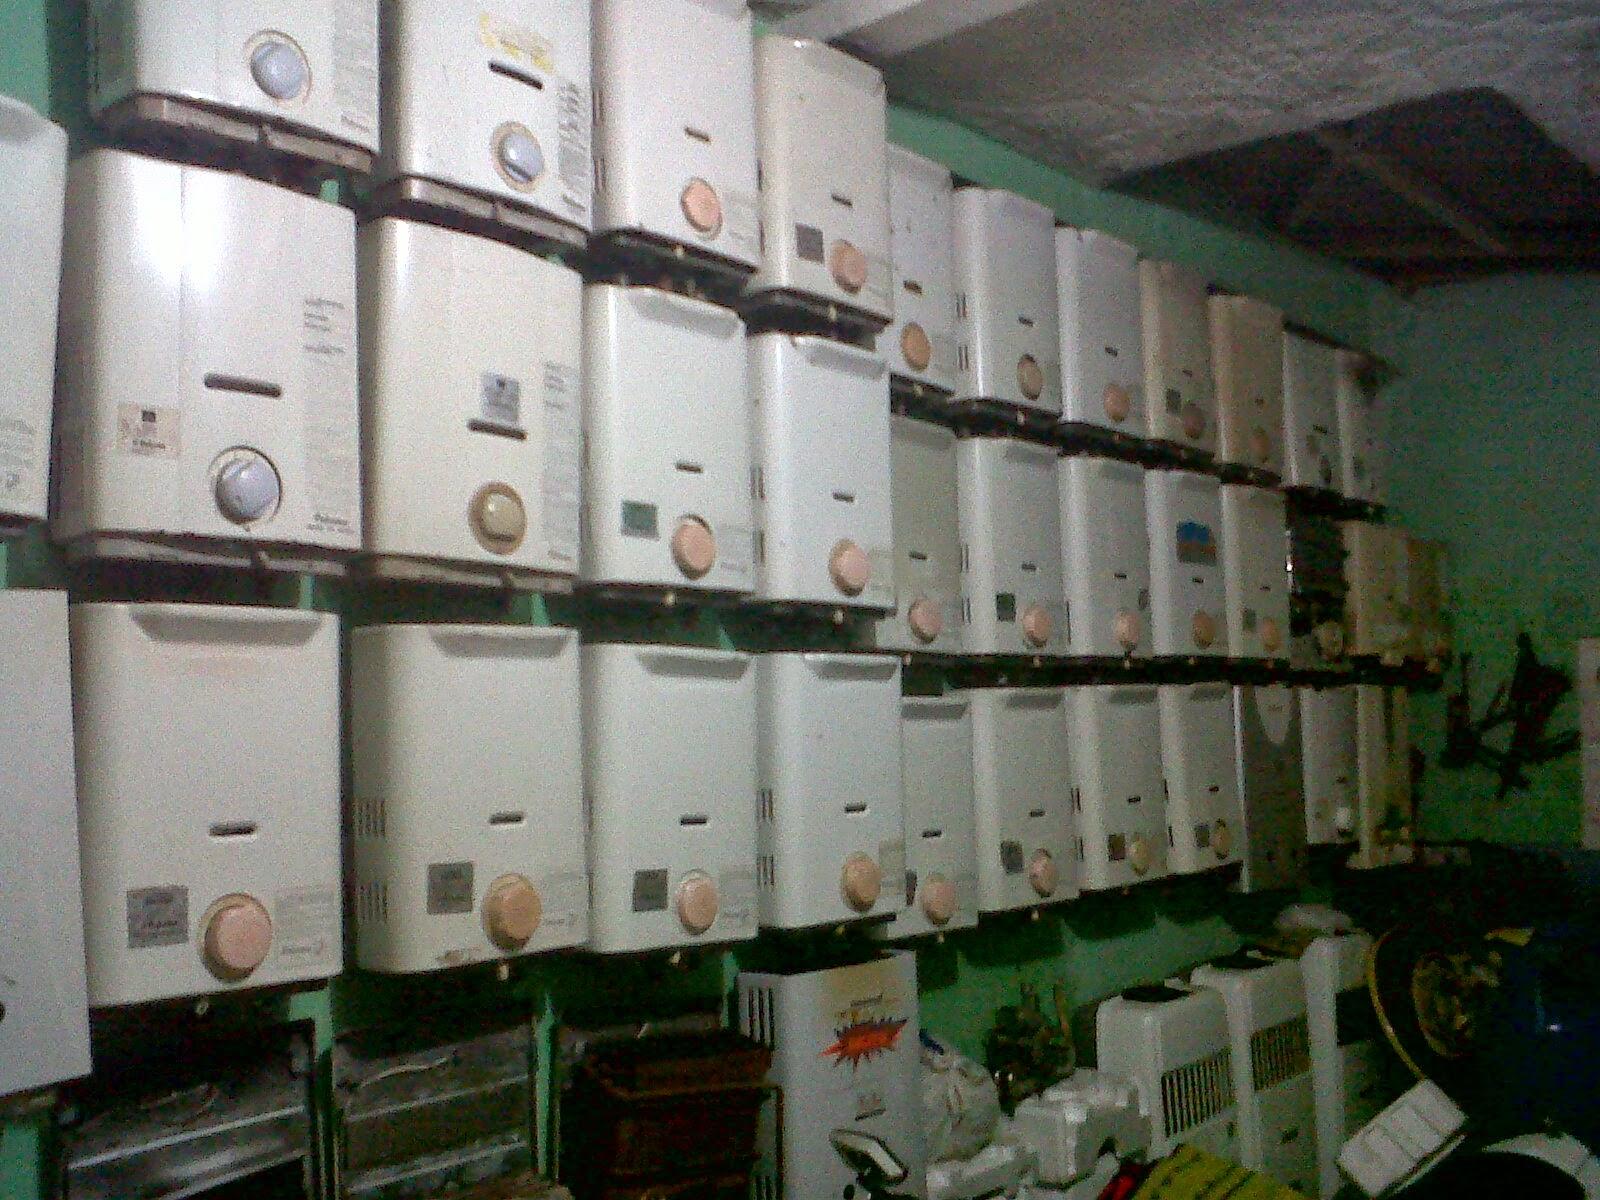 jual water heater baru bekas merk paloma ori made in jepang